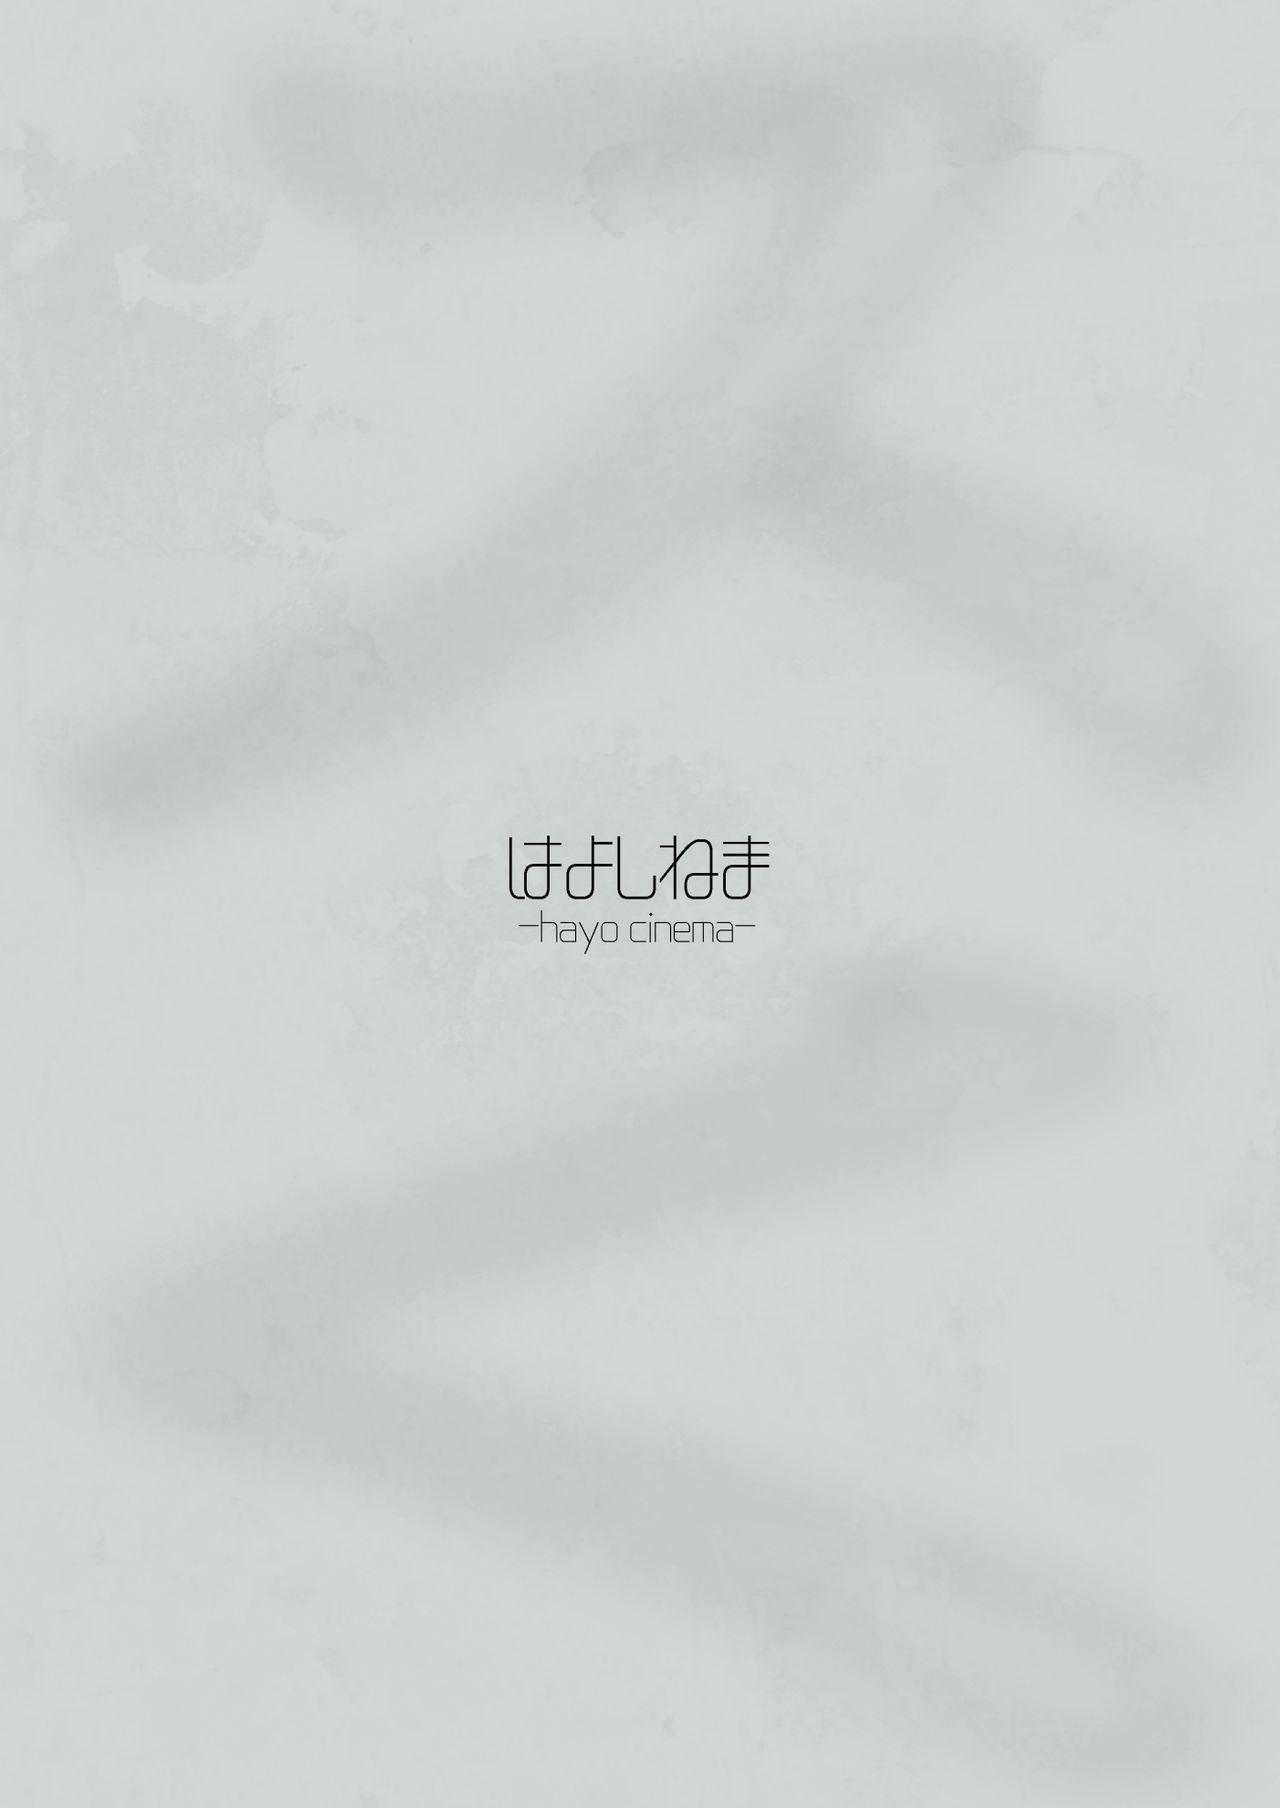 1000 Yen Cut no Onee-san ni Suite Morau Hon. II 18